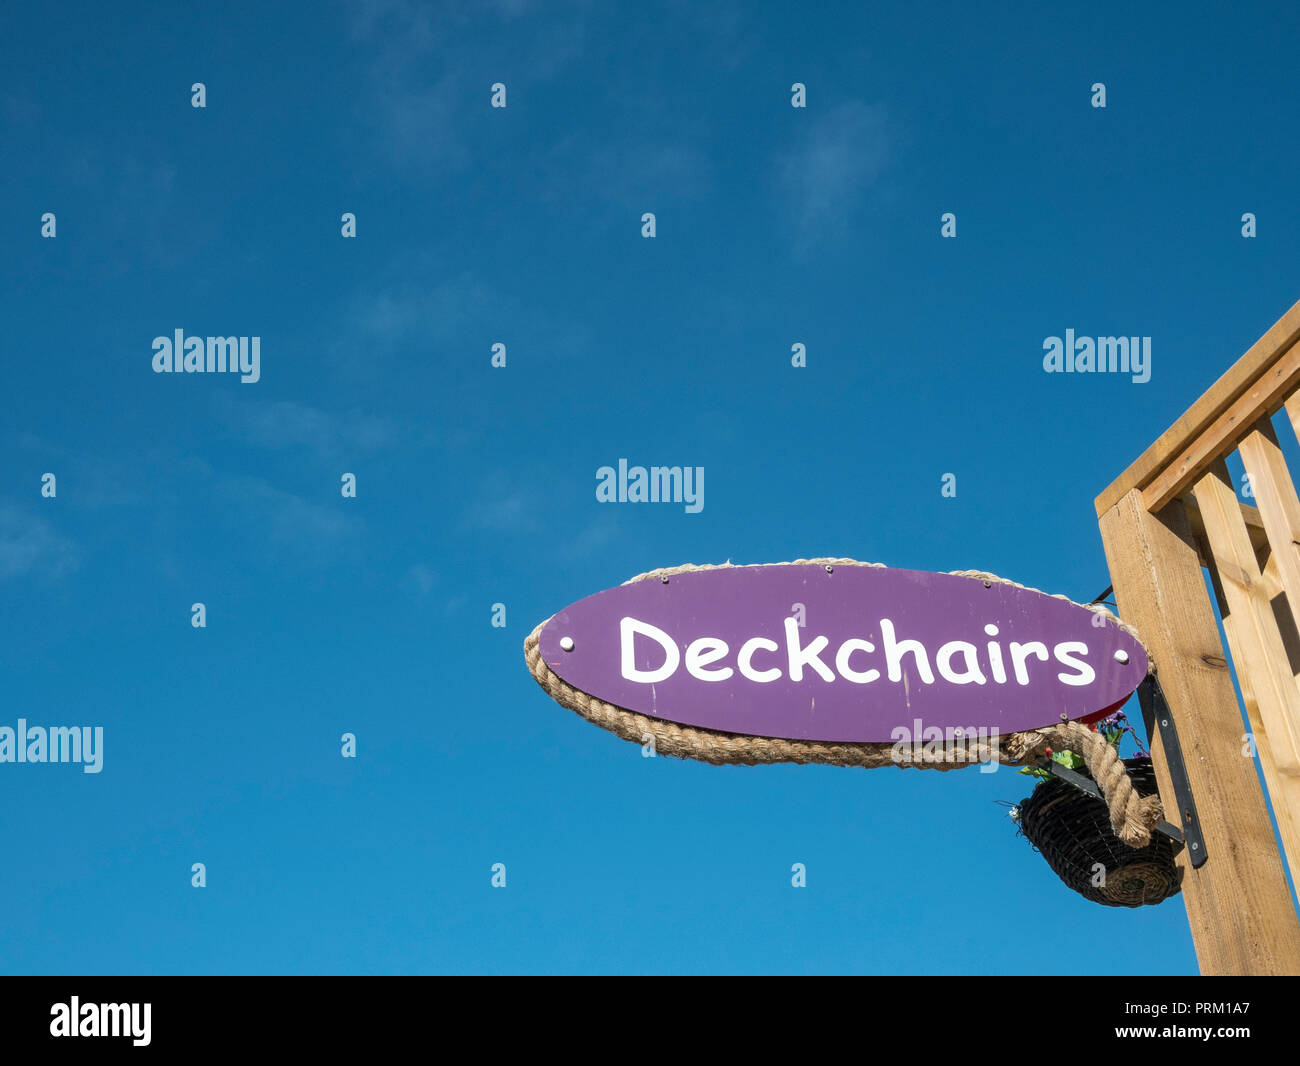 Deckchair Hire Stock Photos Amp Deckchair Hire Stock Images